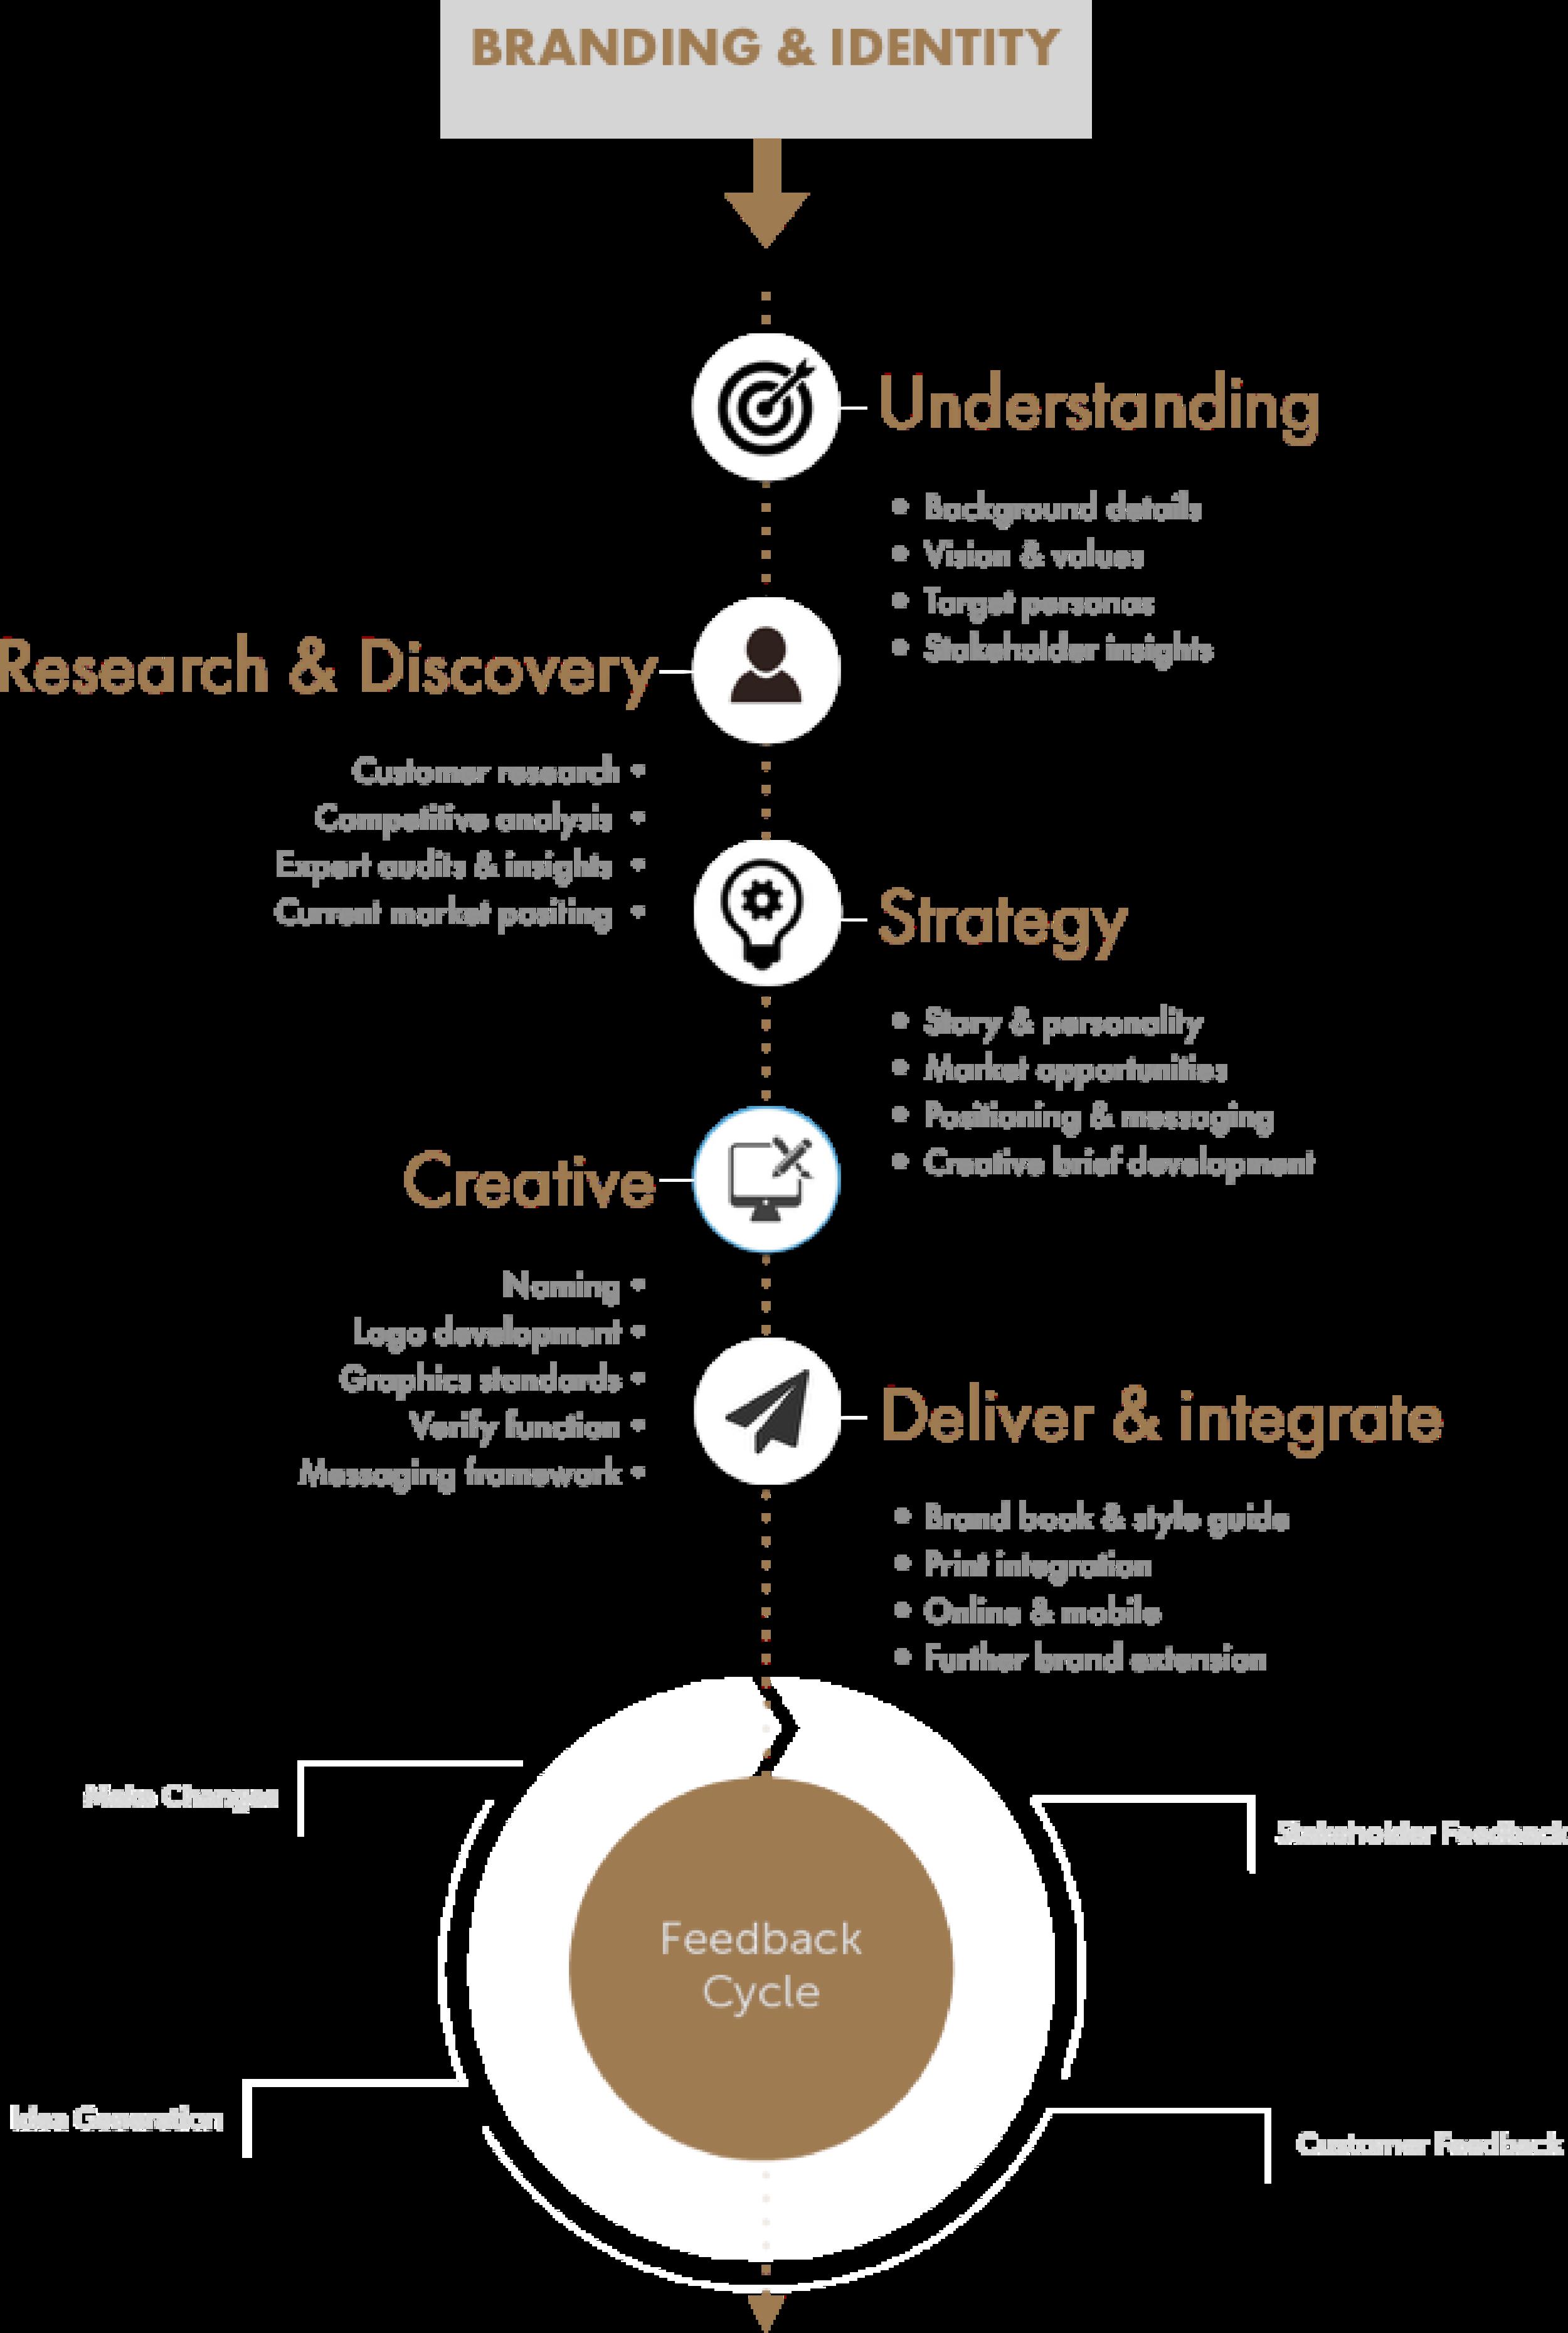 DESIGN-Branding & Identity1.png